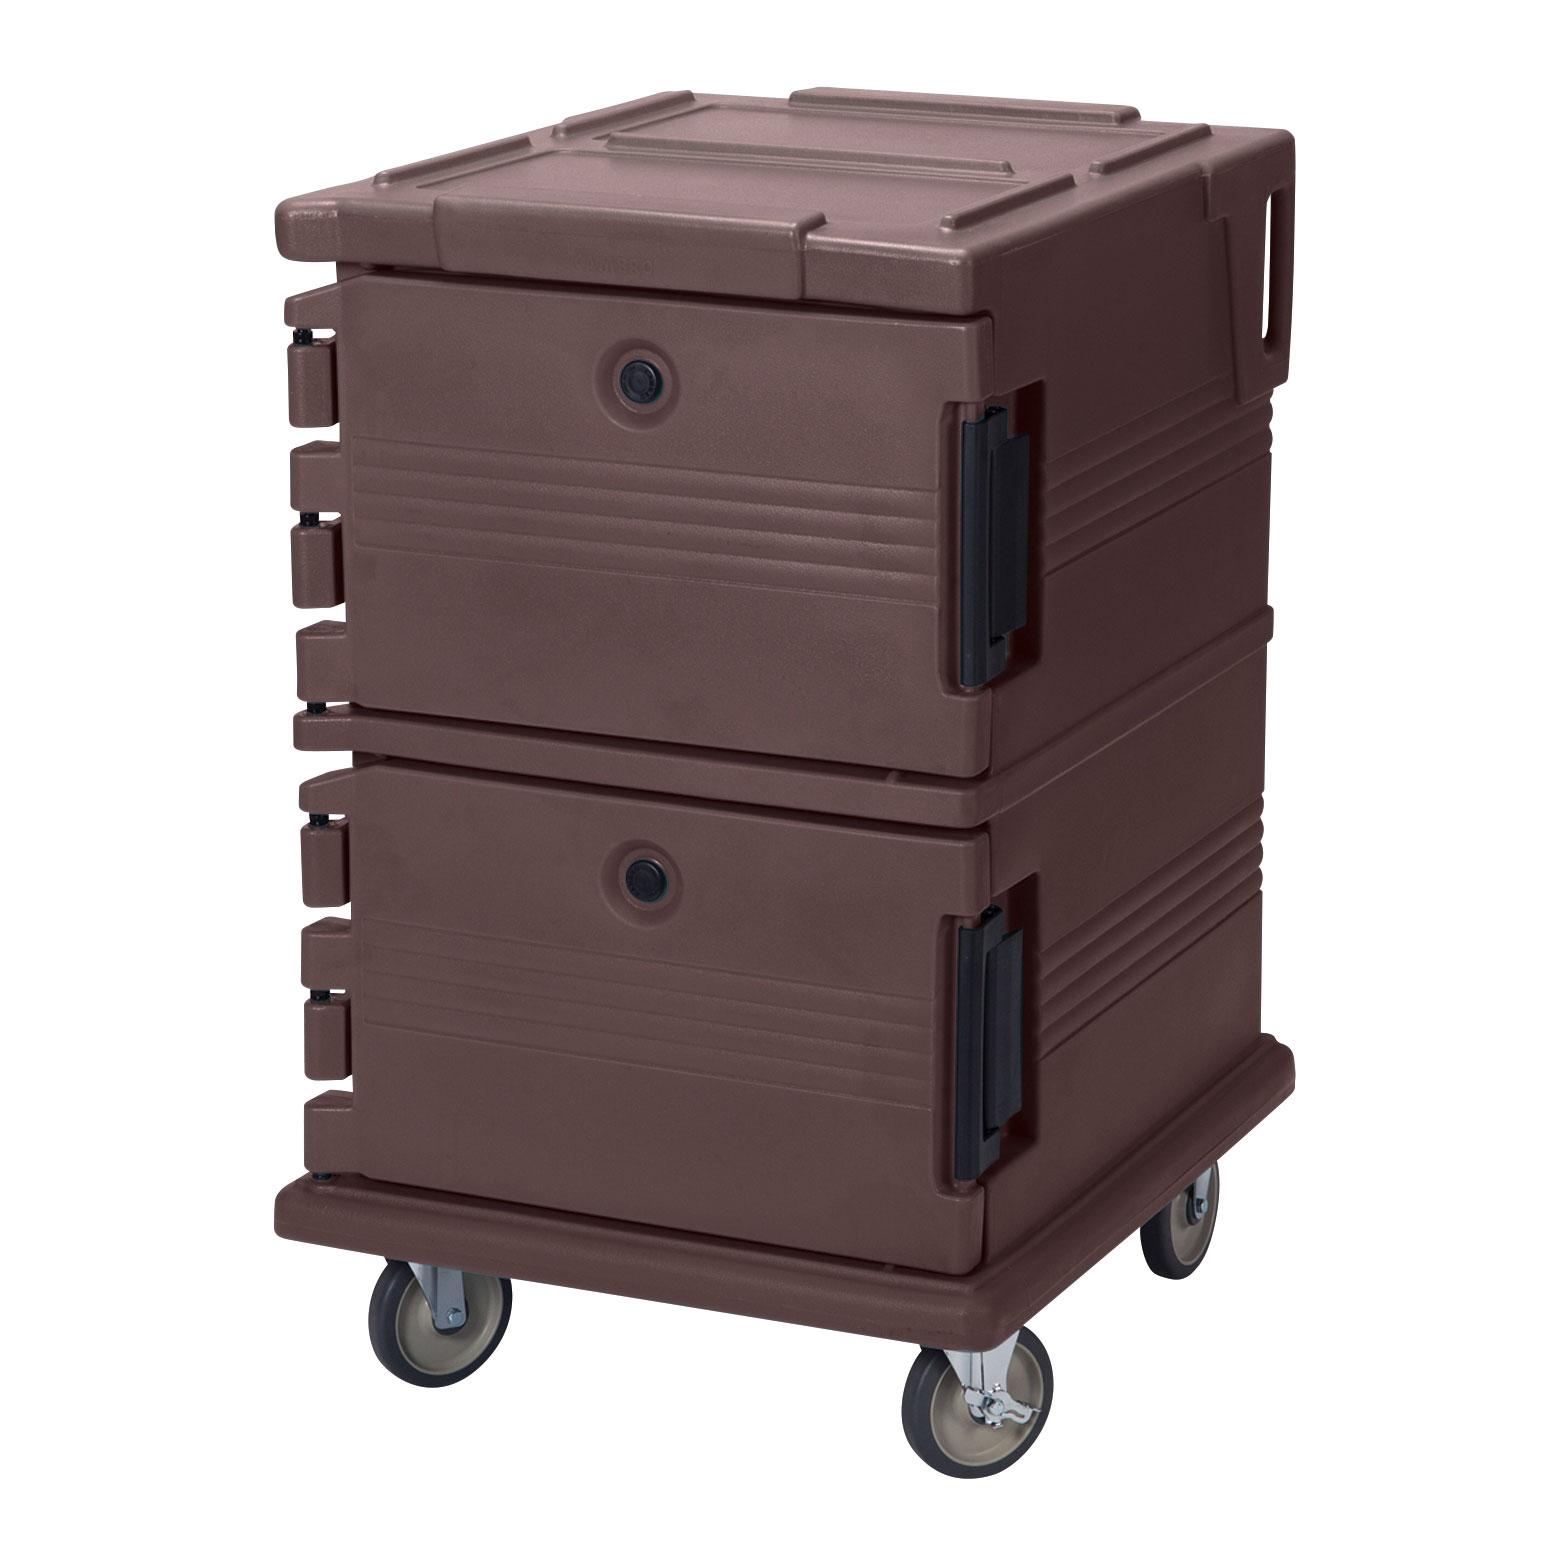 Cambro UPC1200131 insulated food storage